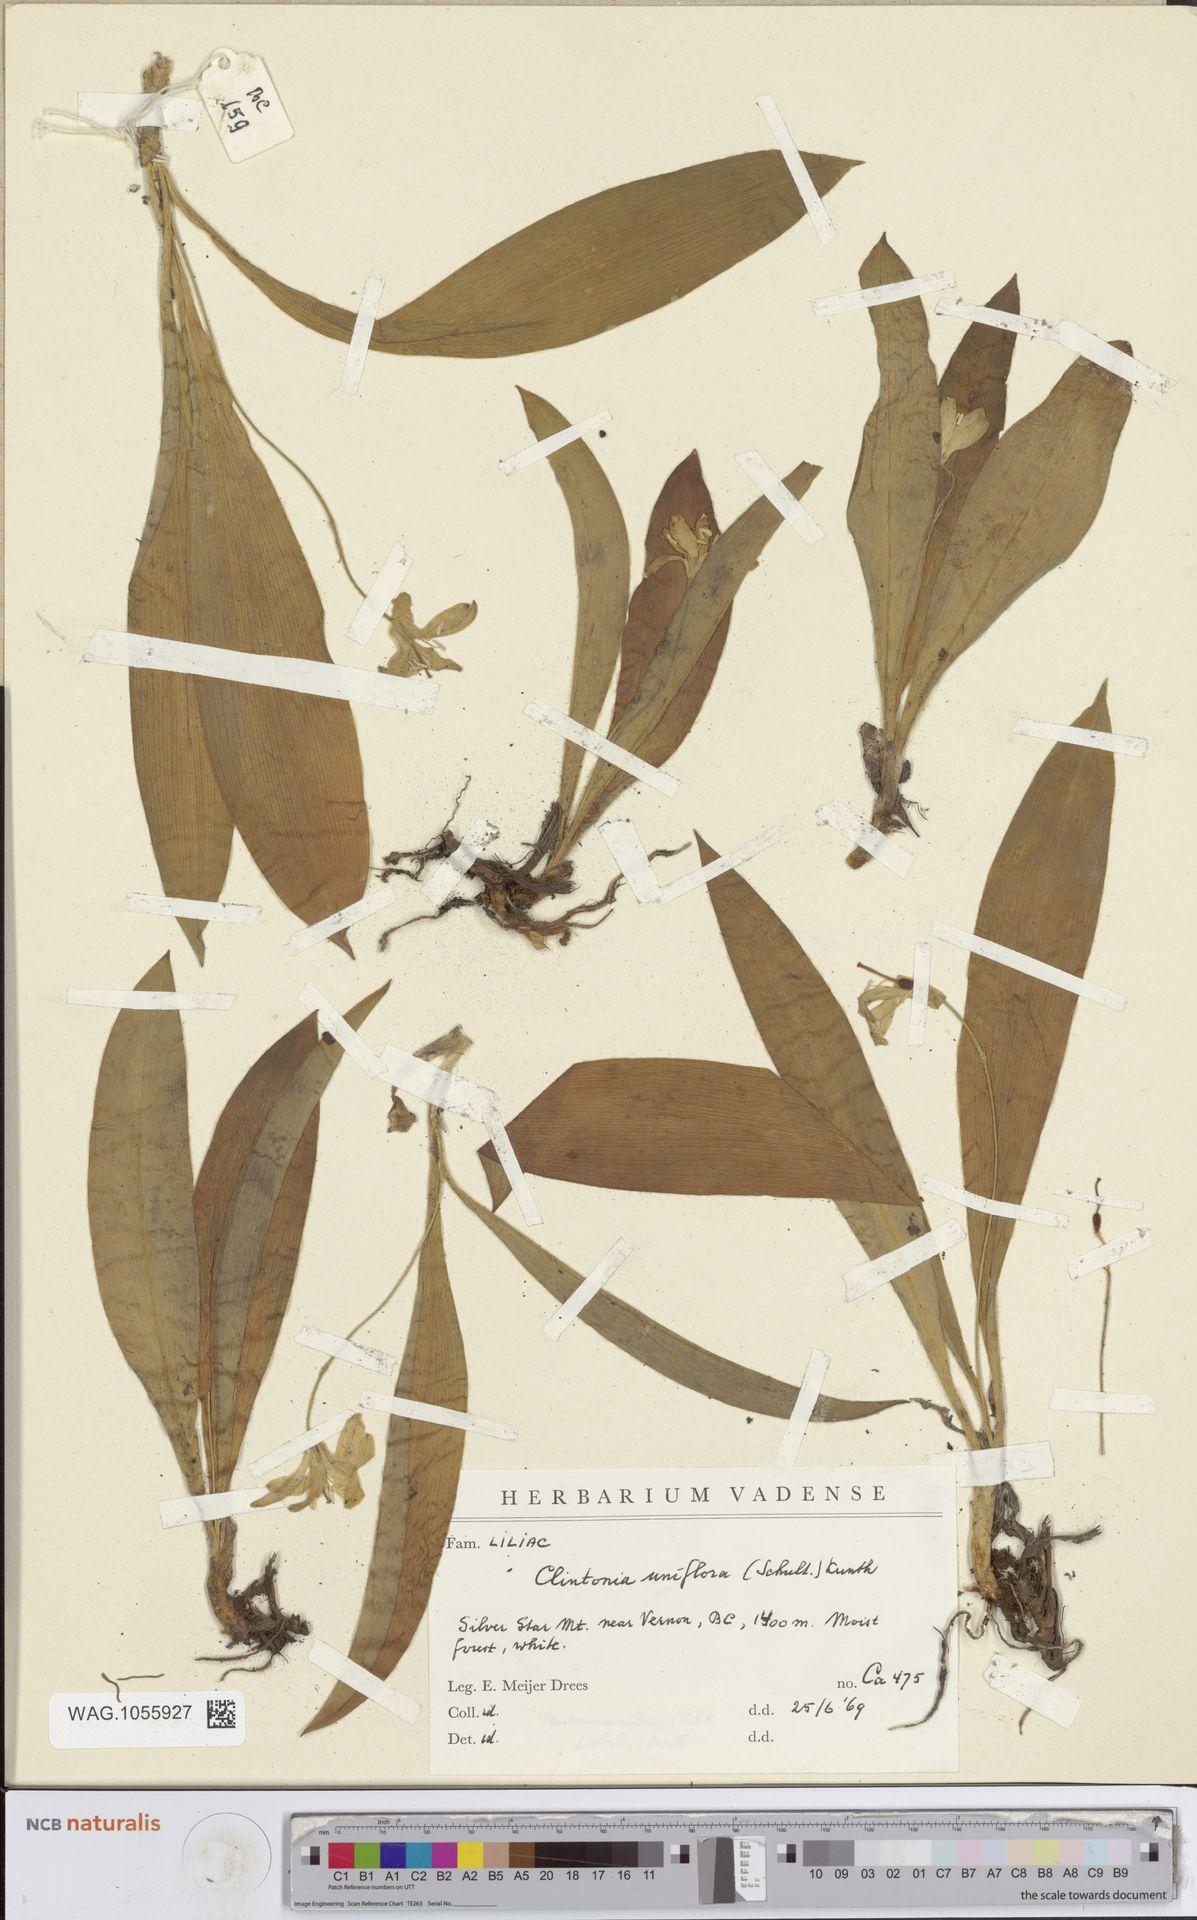 WAG.1055927 | Clintonia uniflora Kunth